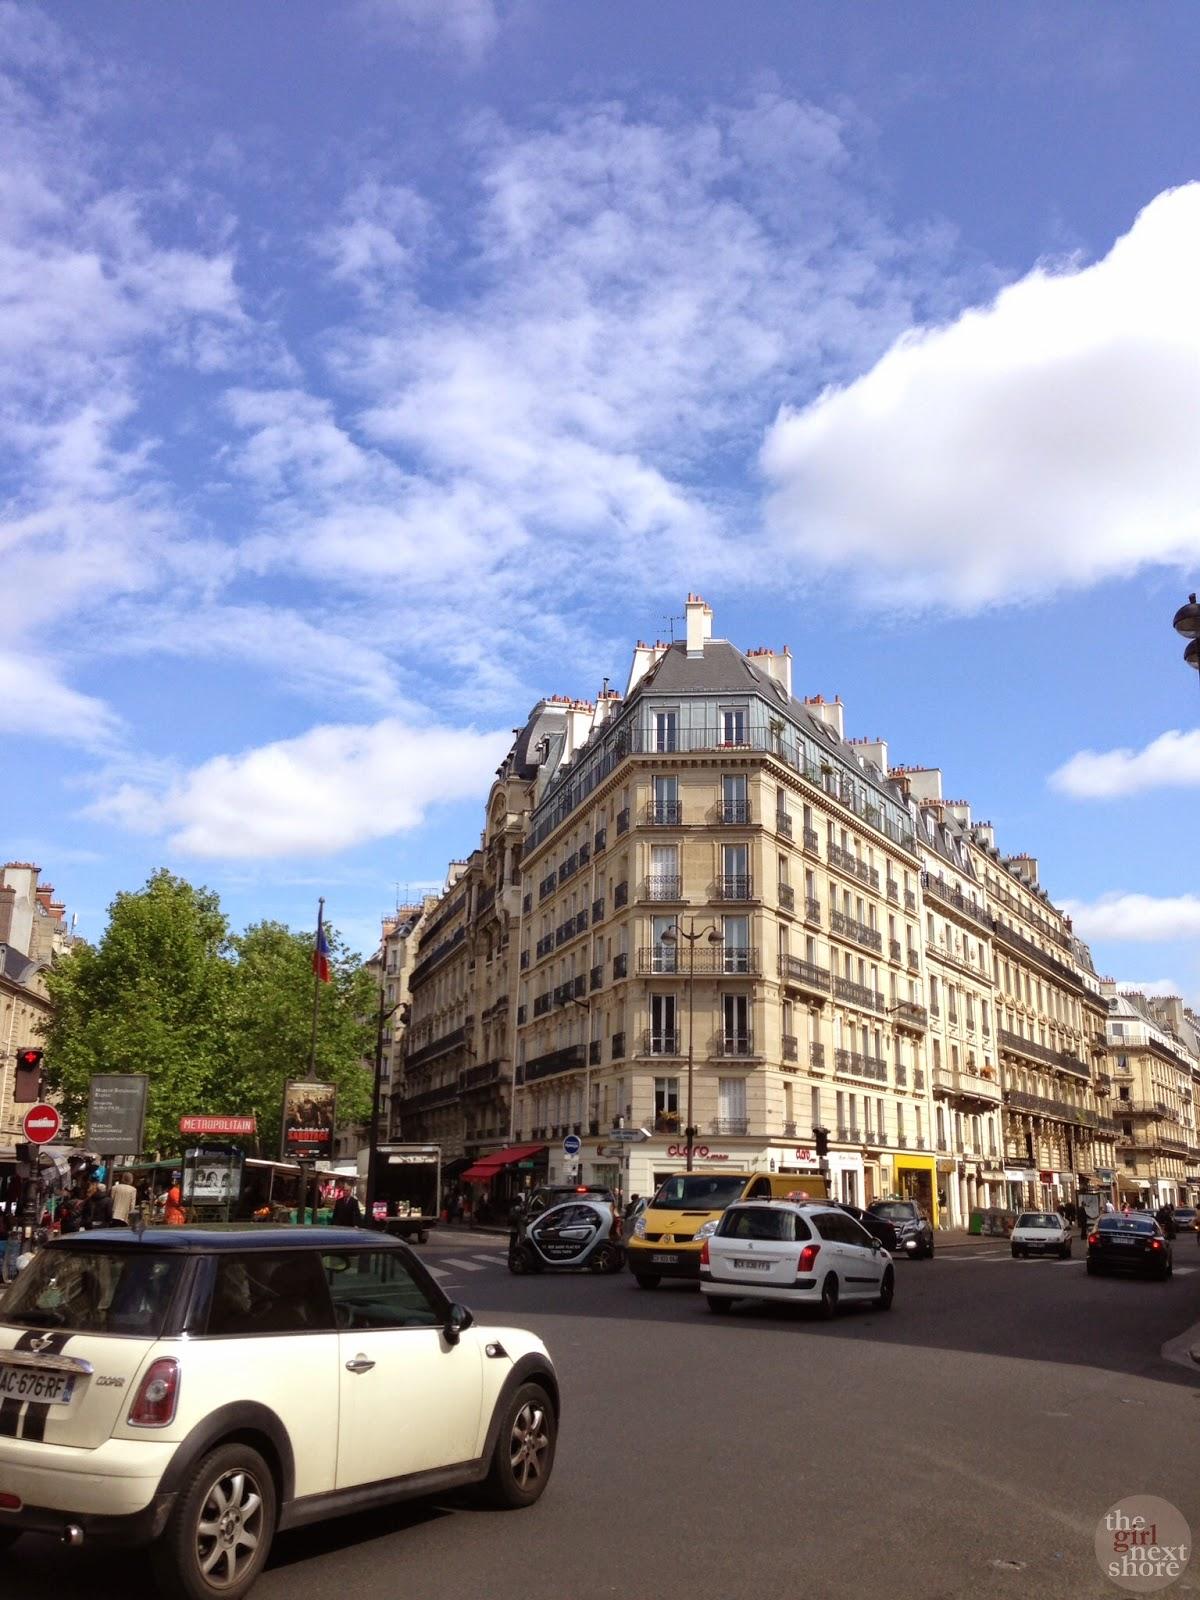 Plaid Boy and Girl Next Shore in Paris: Saint-Germain, Notre Dame & Love Locks